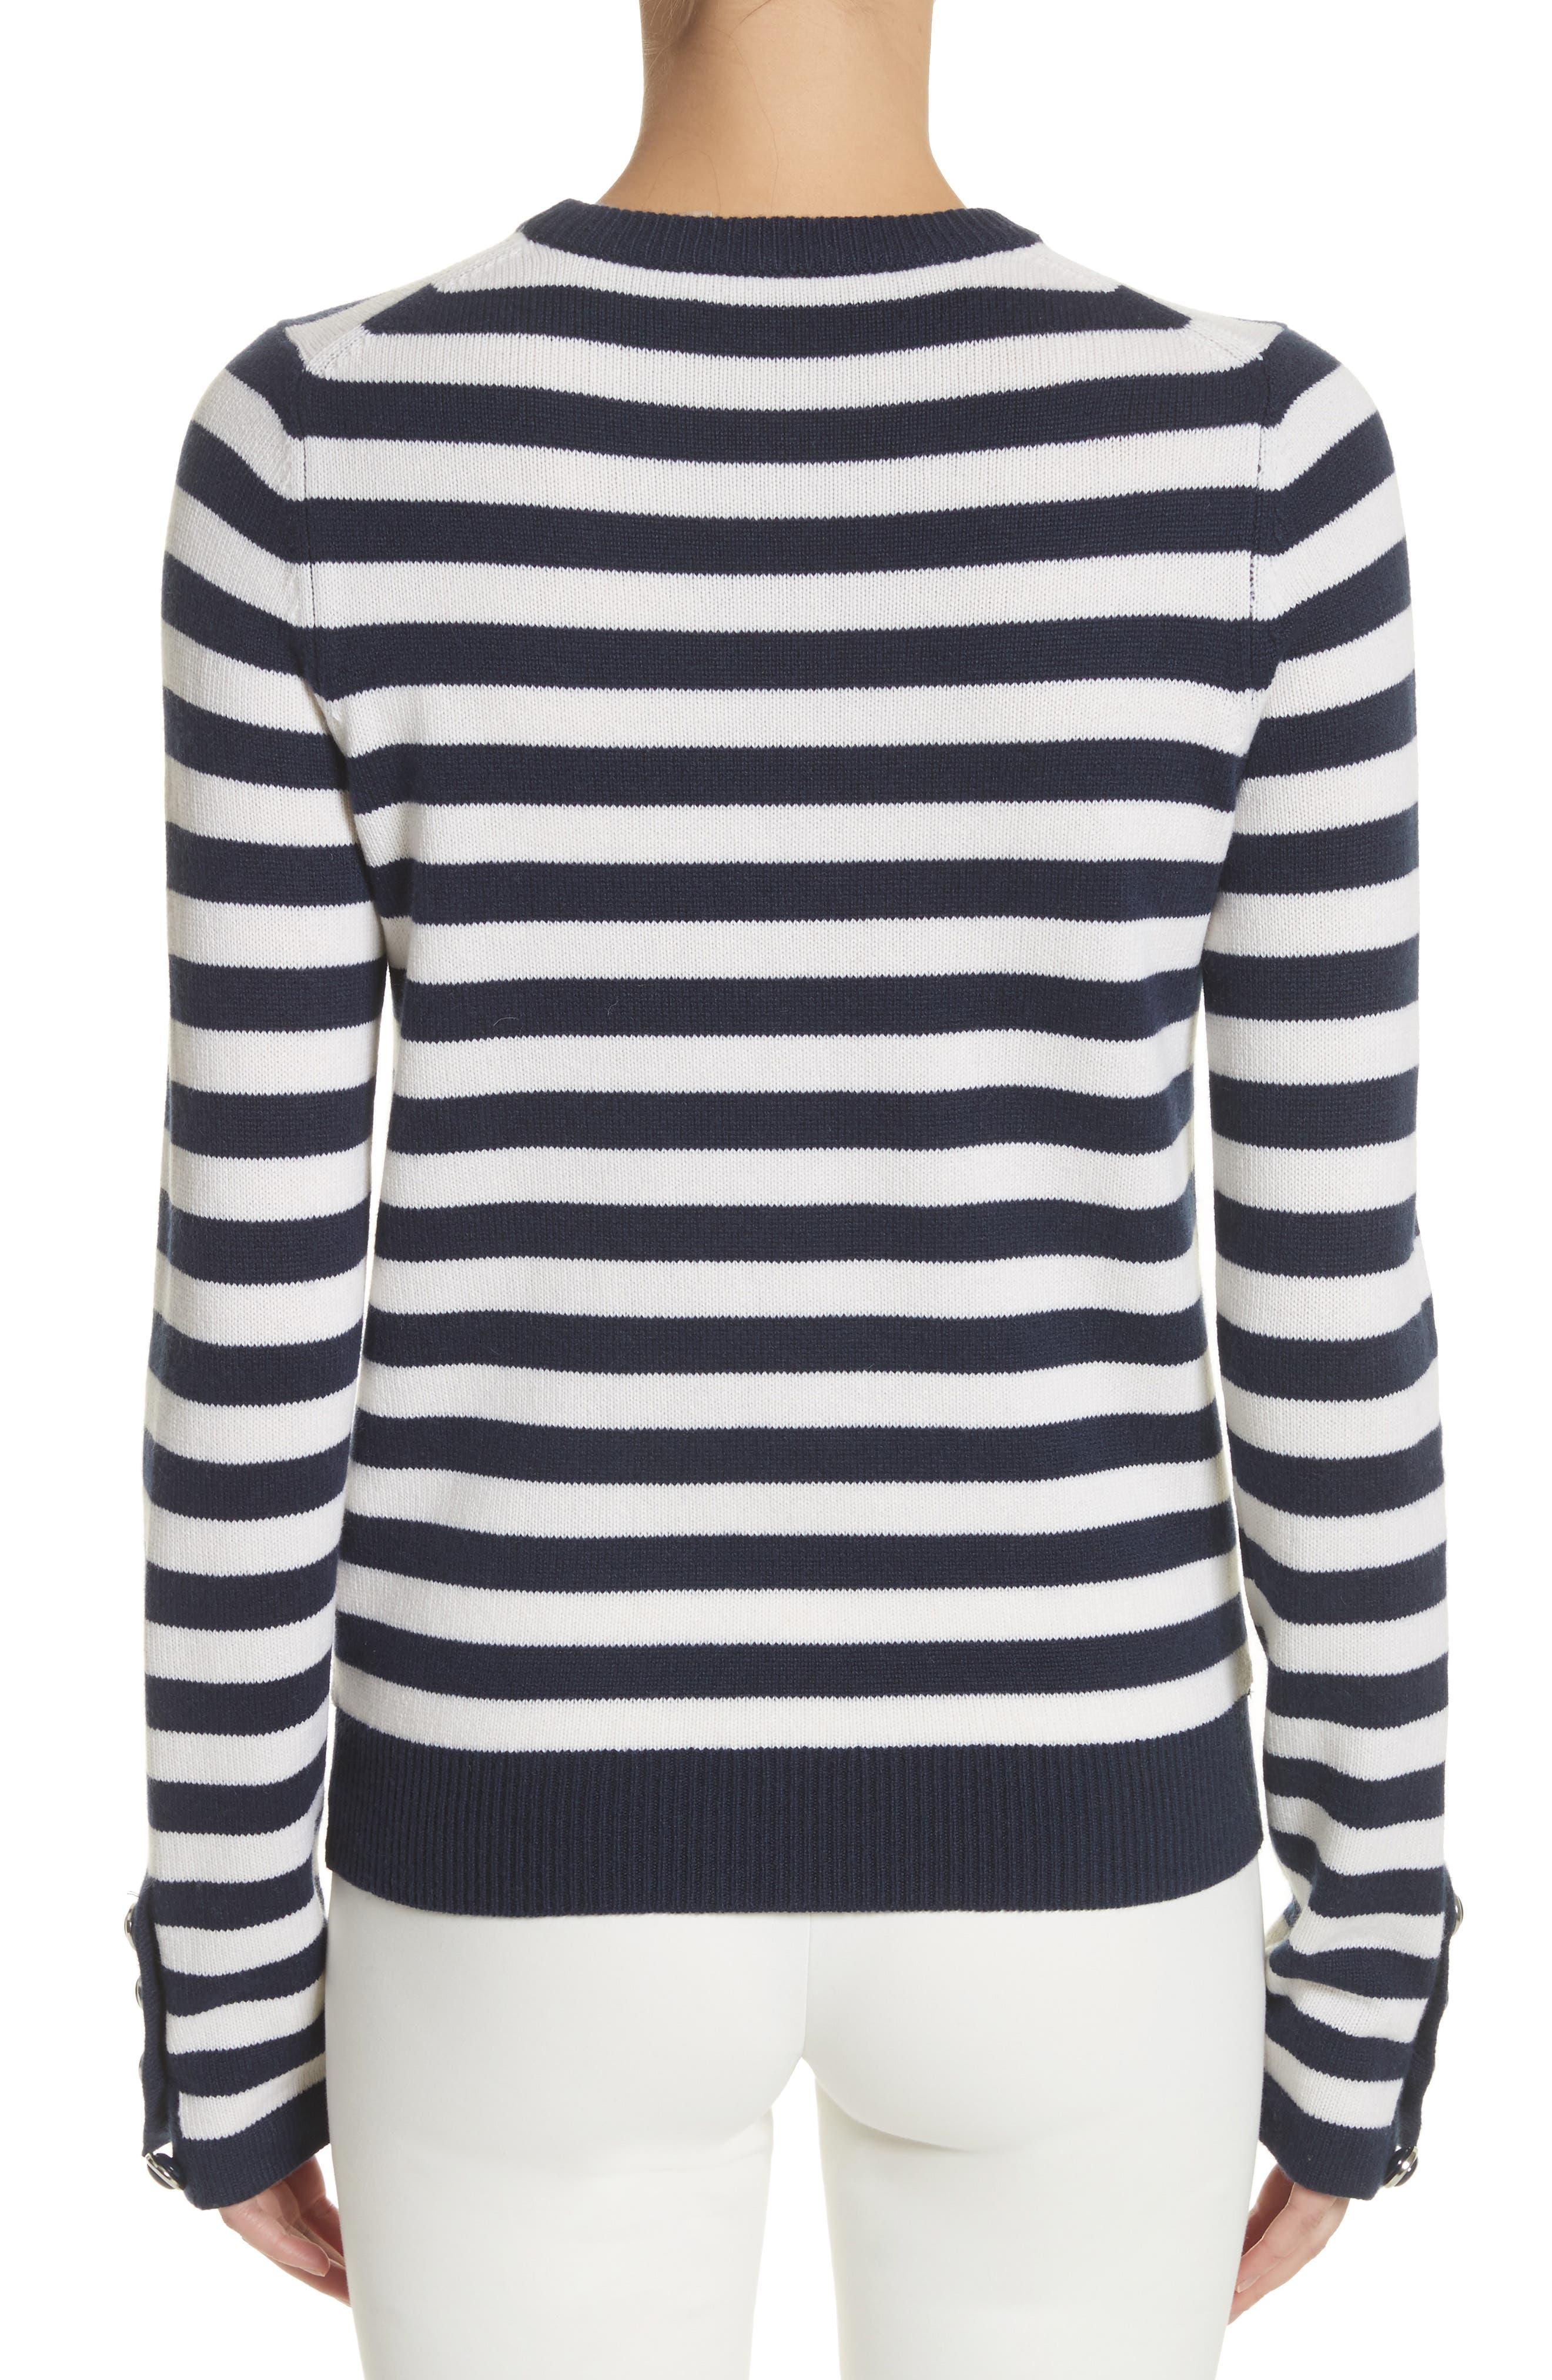 Alternate Image 2  - Michael Kors Button Cuff Cashmere Sweater